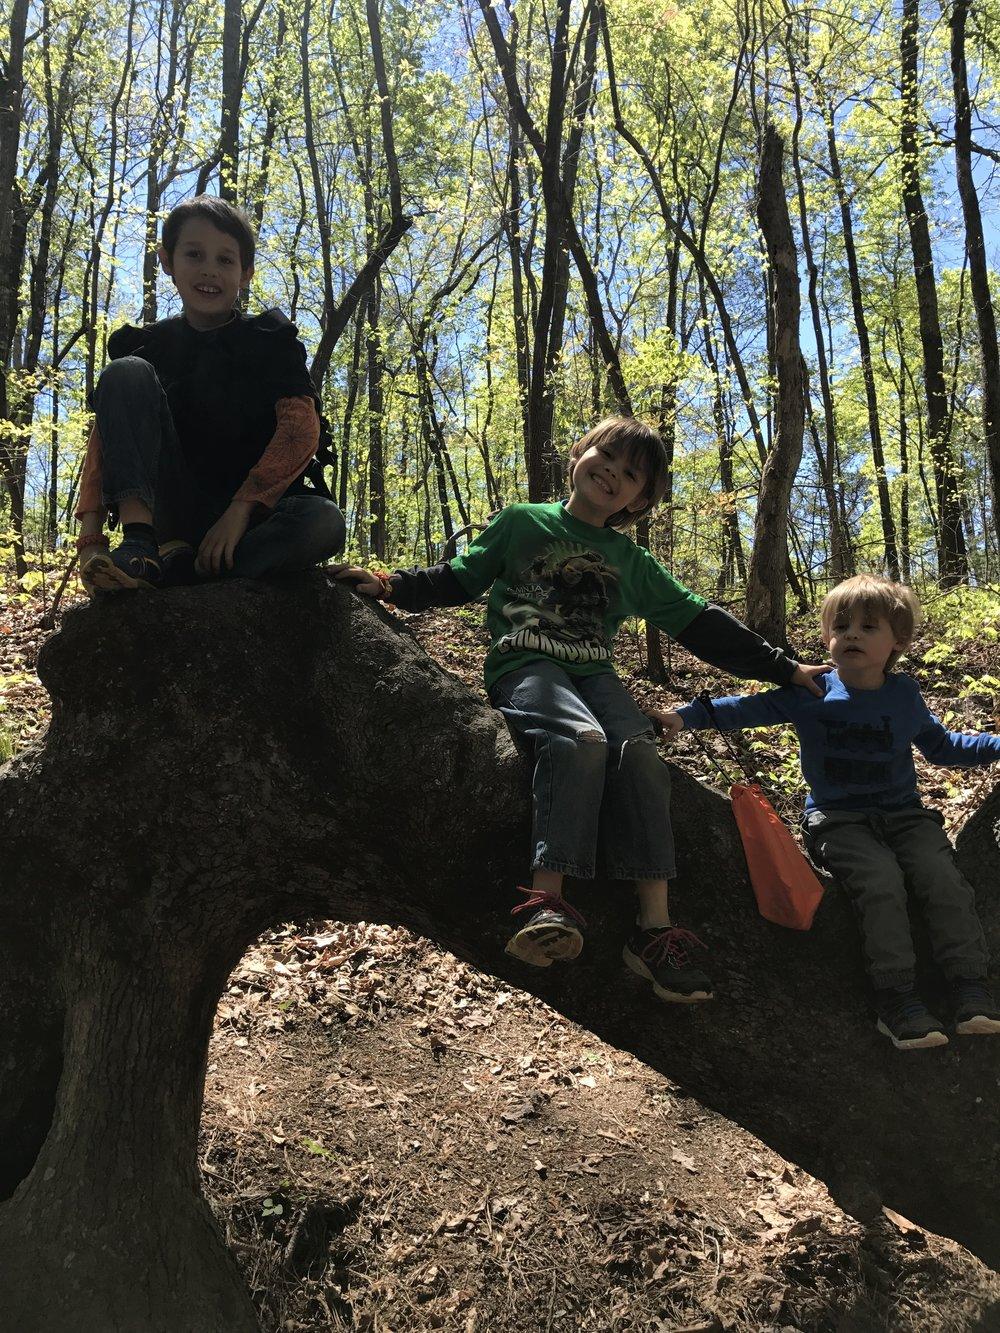 Boys climbing tree